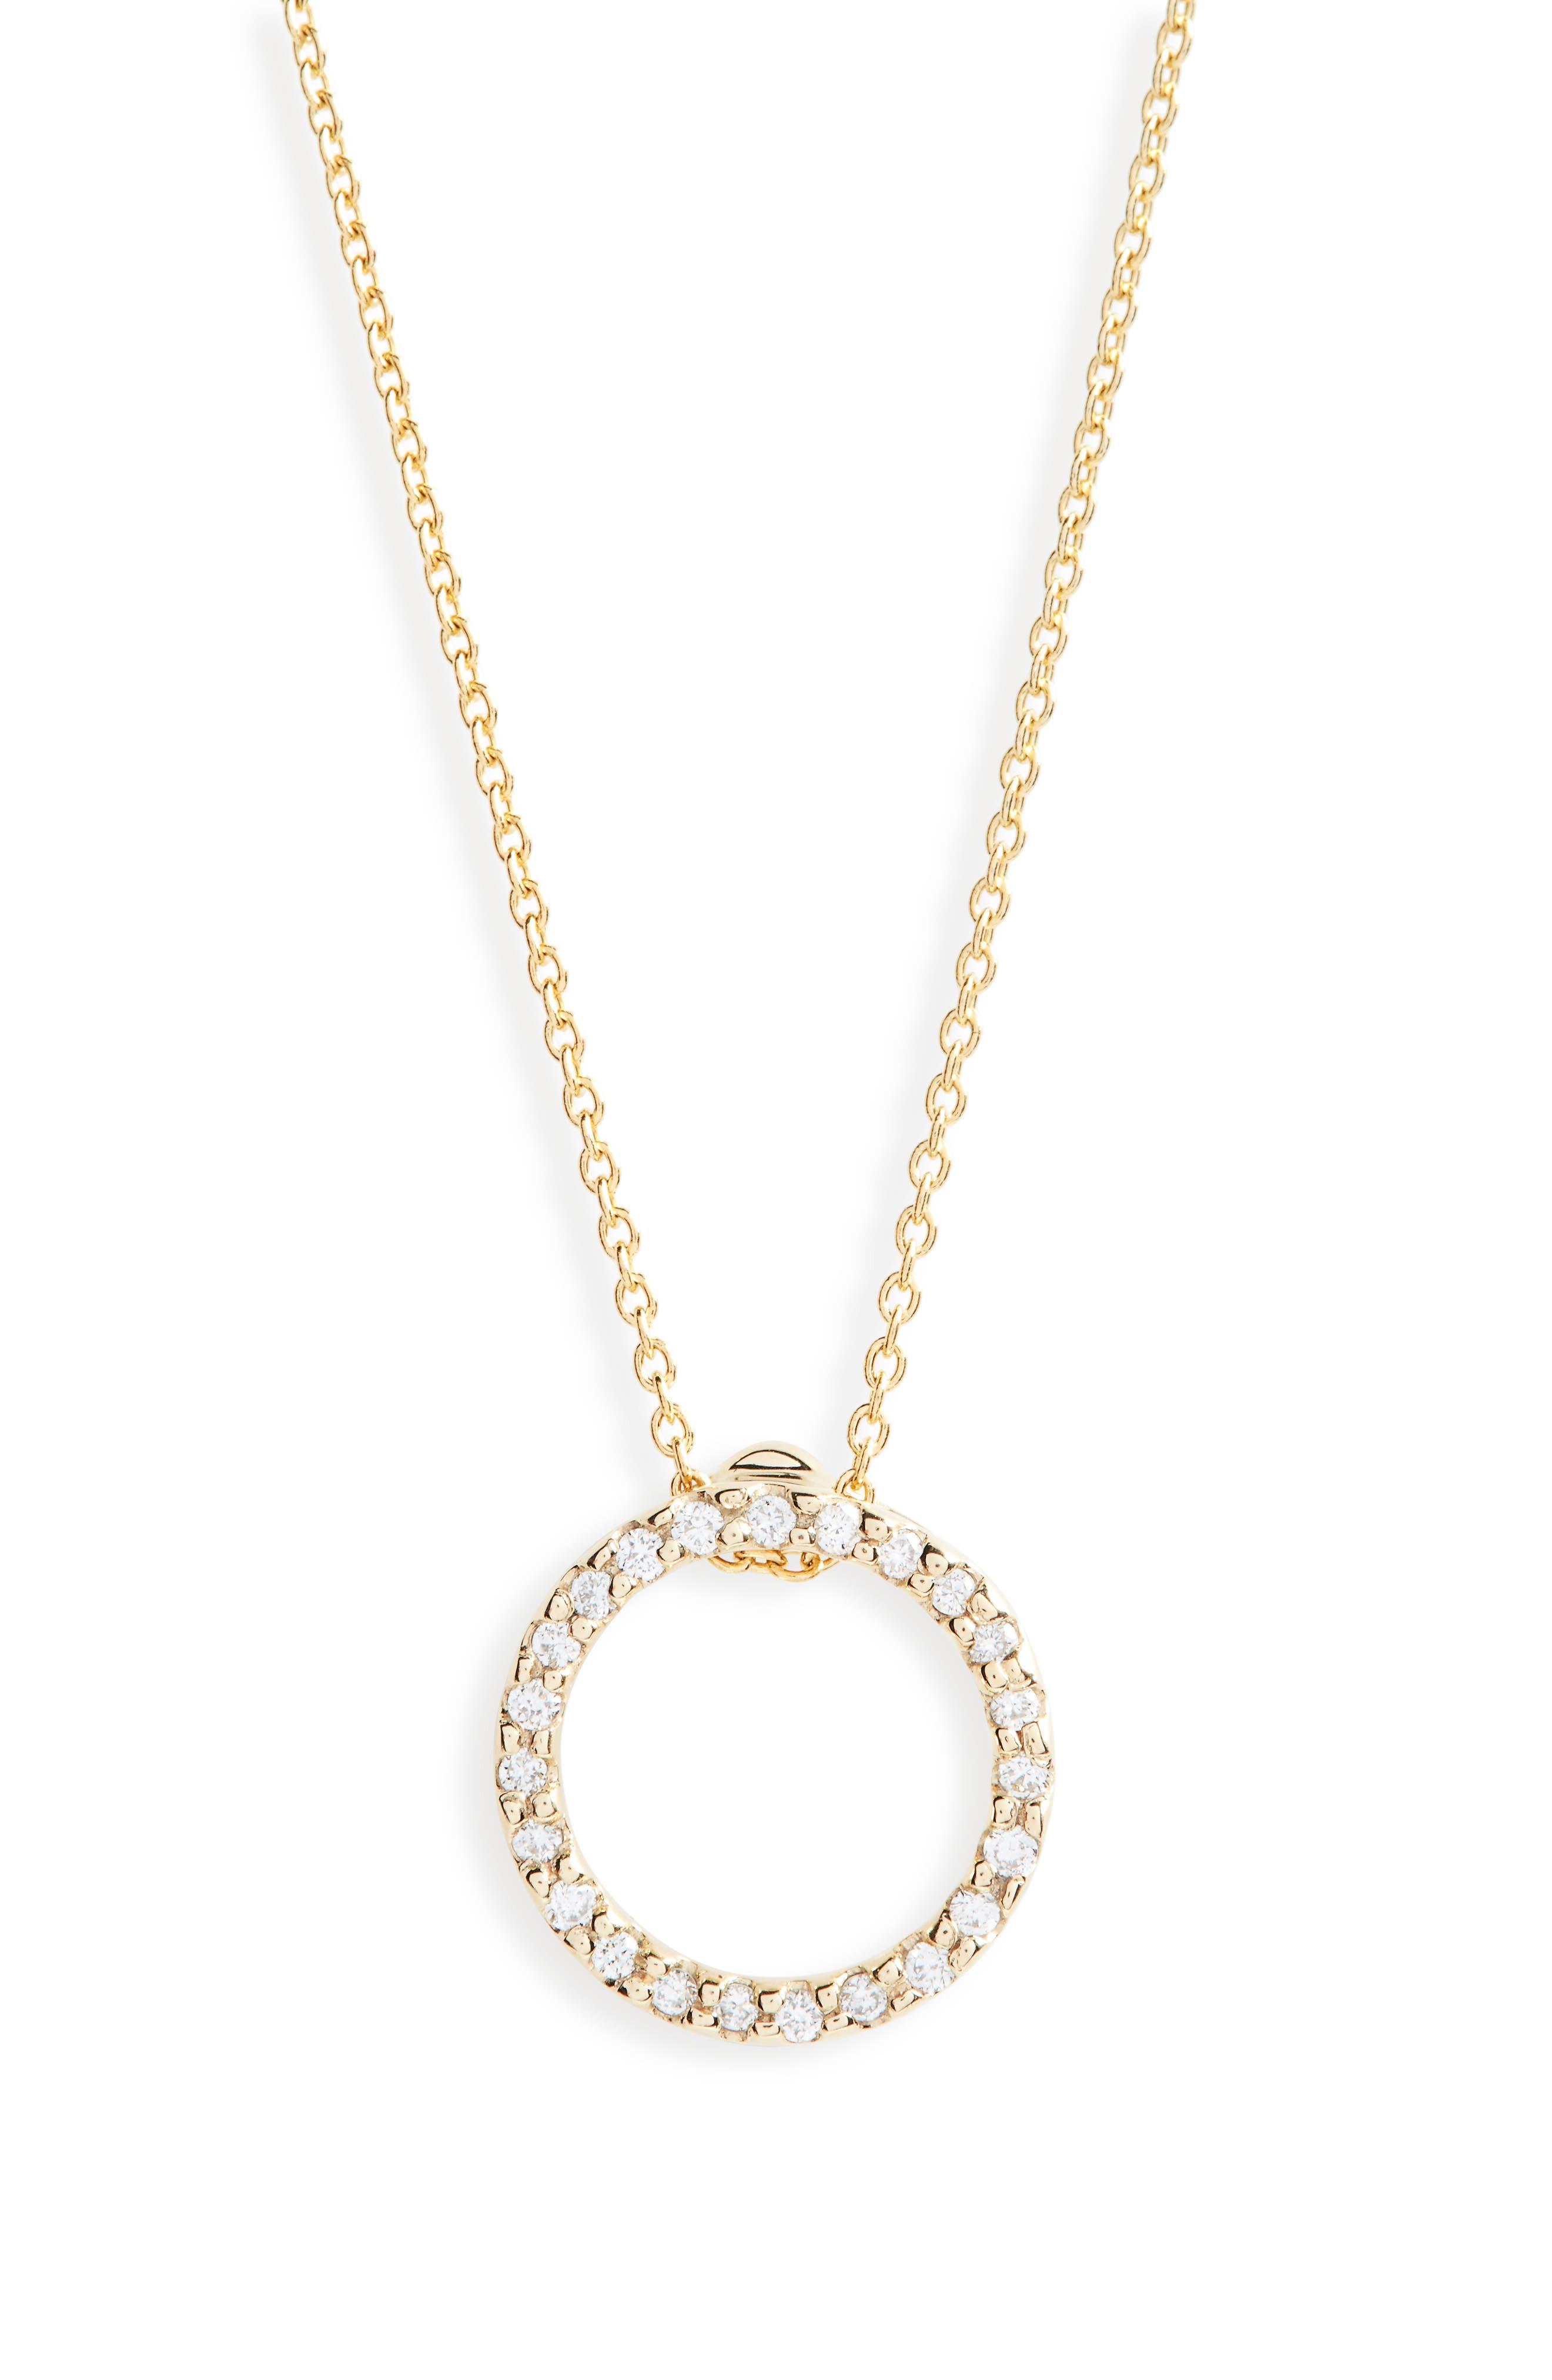 Main Image - Roberto Coin XS Diamond Pendant Necklace